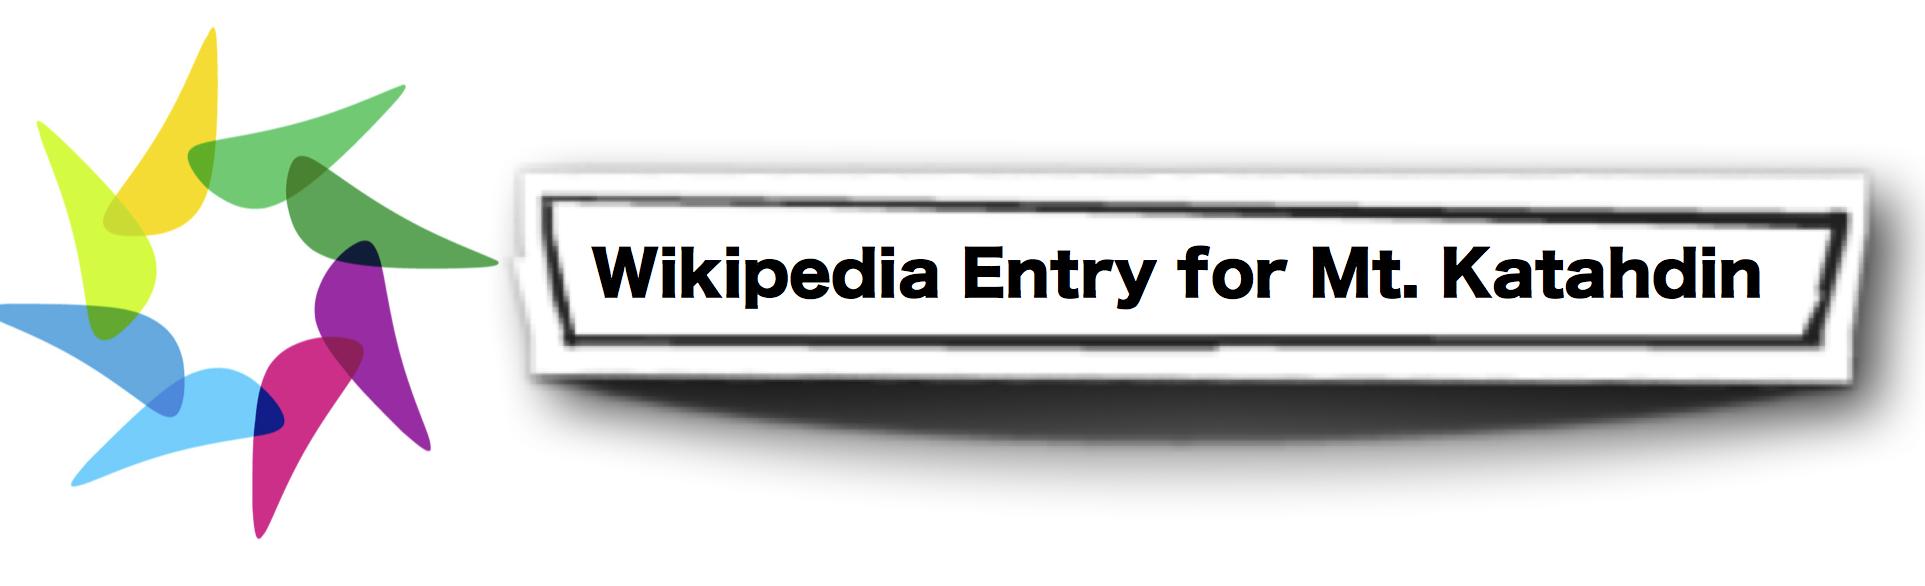 Wiki Entry 2 Katahdin.png